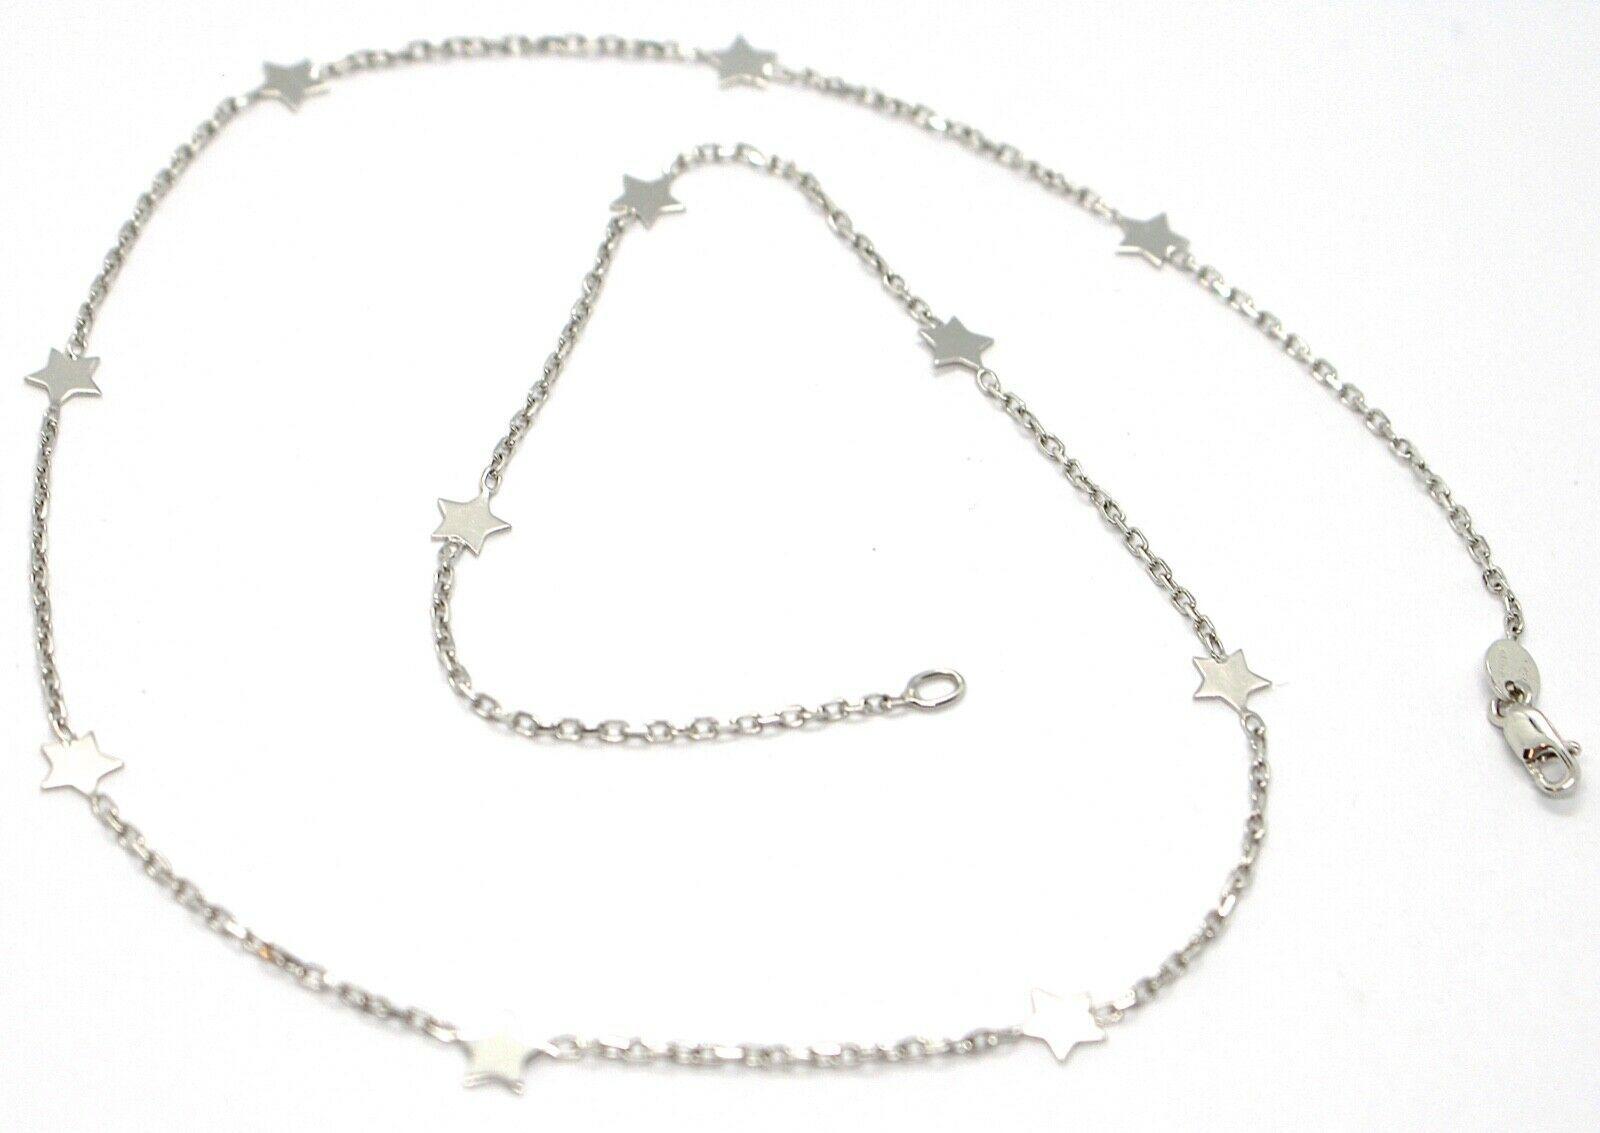 Halskette Weißgold 750 18K, Kette Rolo Eckig, Sterne Flach Alternate